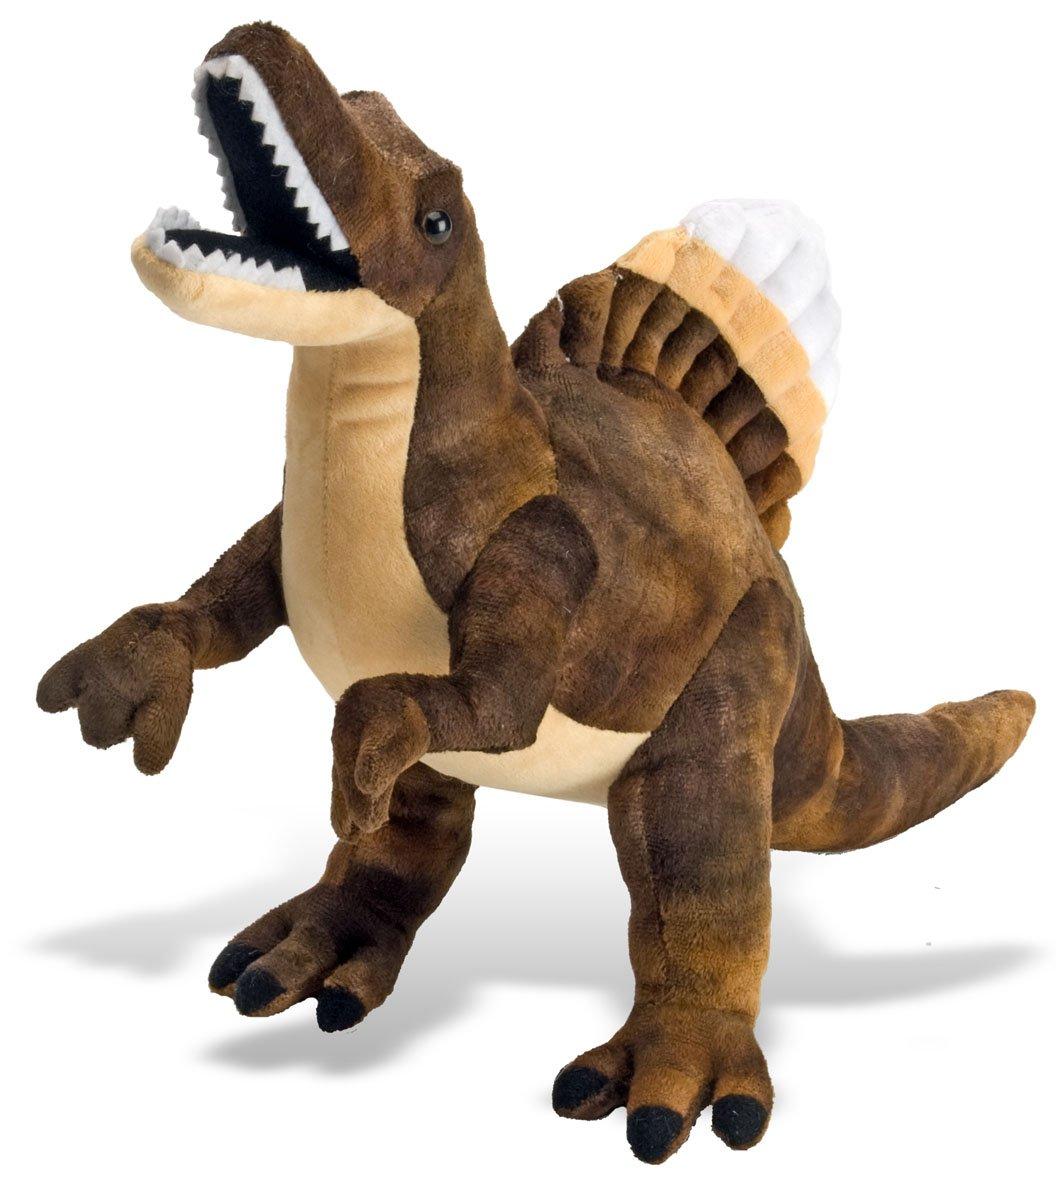 Wild Republic Spinosaurus Plush, Dinosaur Stuffed Animal, Plush Toy, Kids Gifts, Dinosauria, 15'' by Wild Republic